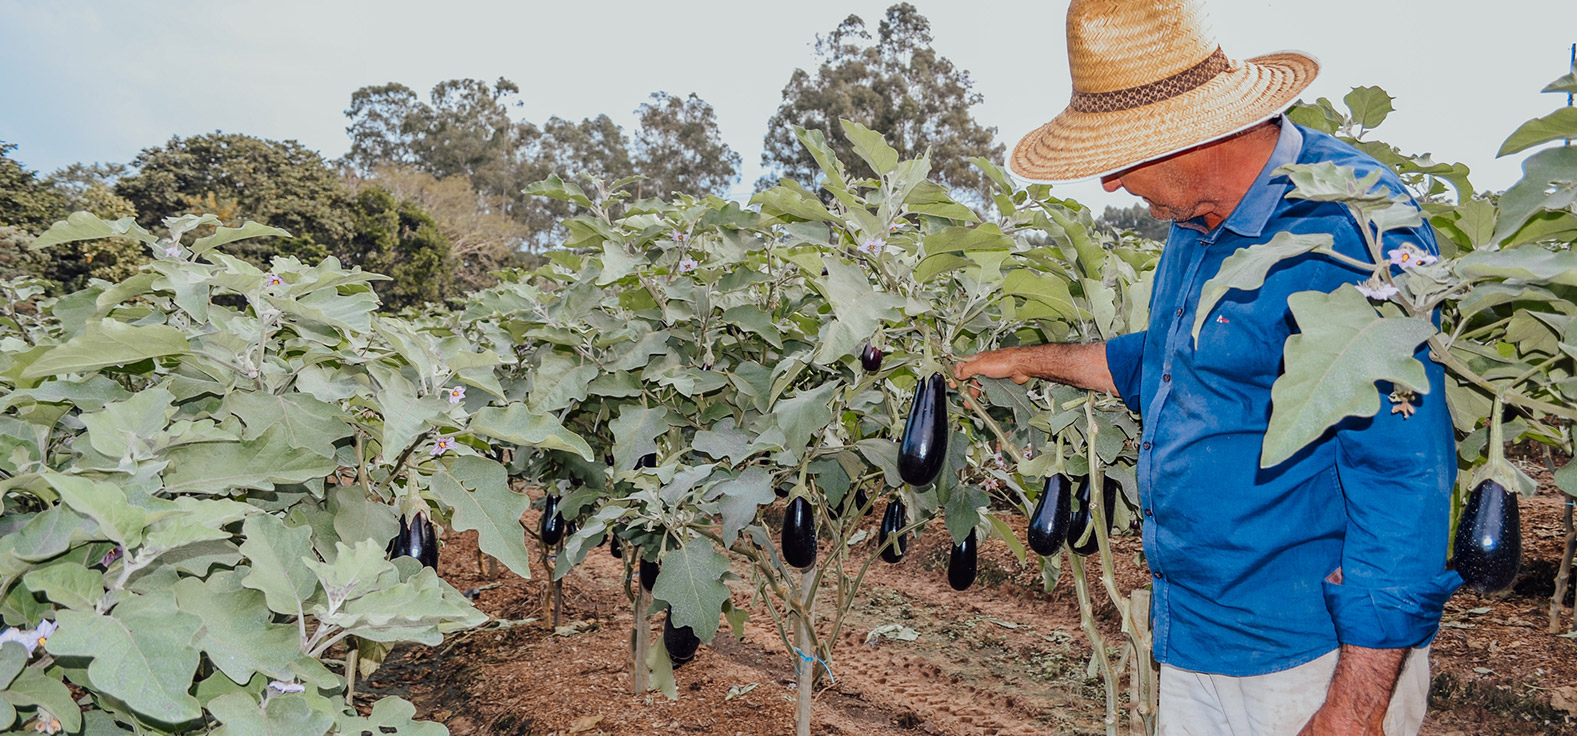 Agricultura Familiar em Corumbataí | Portal Serra do Itaquerí